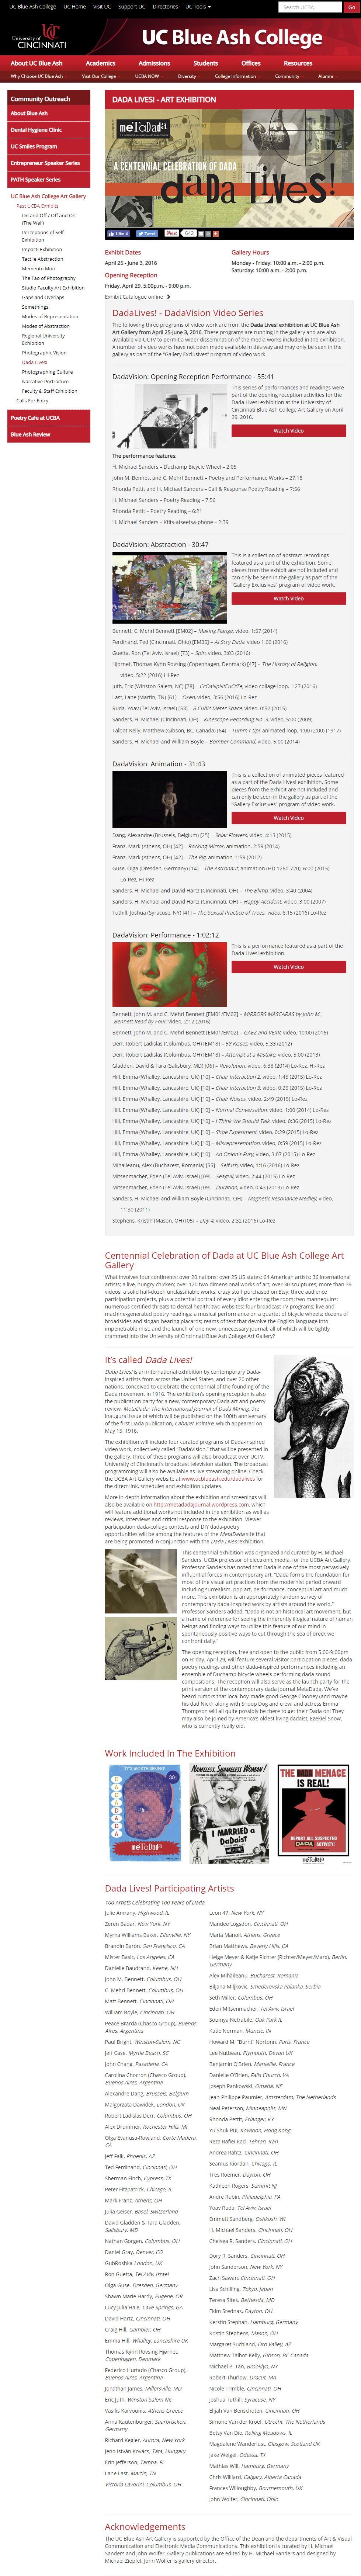 04-25-2016-06-3-2016_Dada Lives!_University of Cincinnati, Blue Ash, OH.jpg